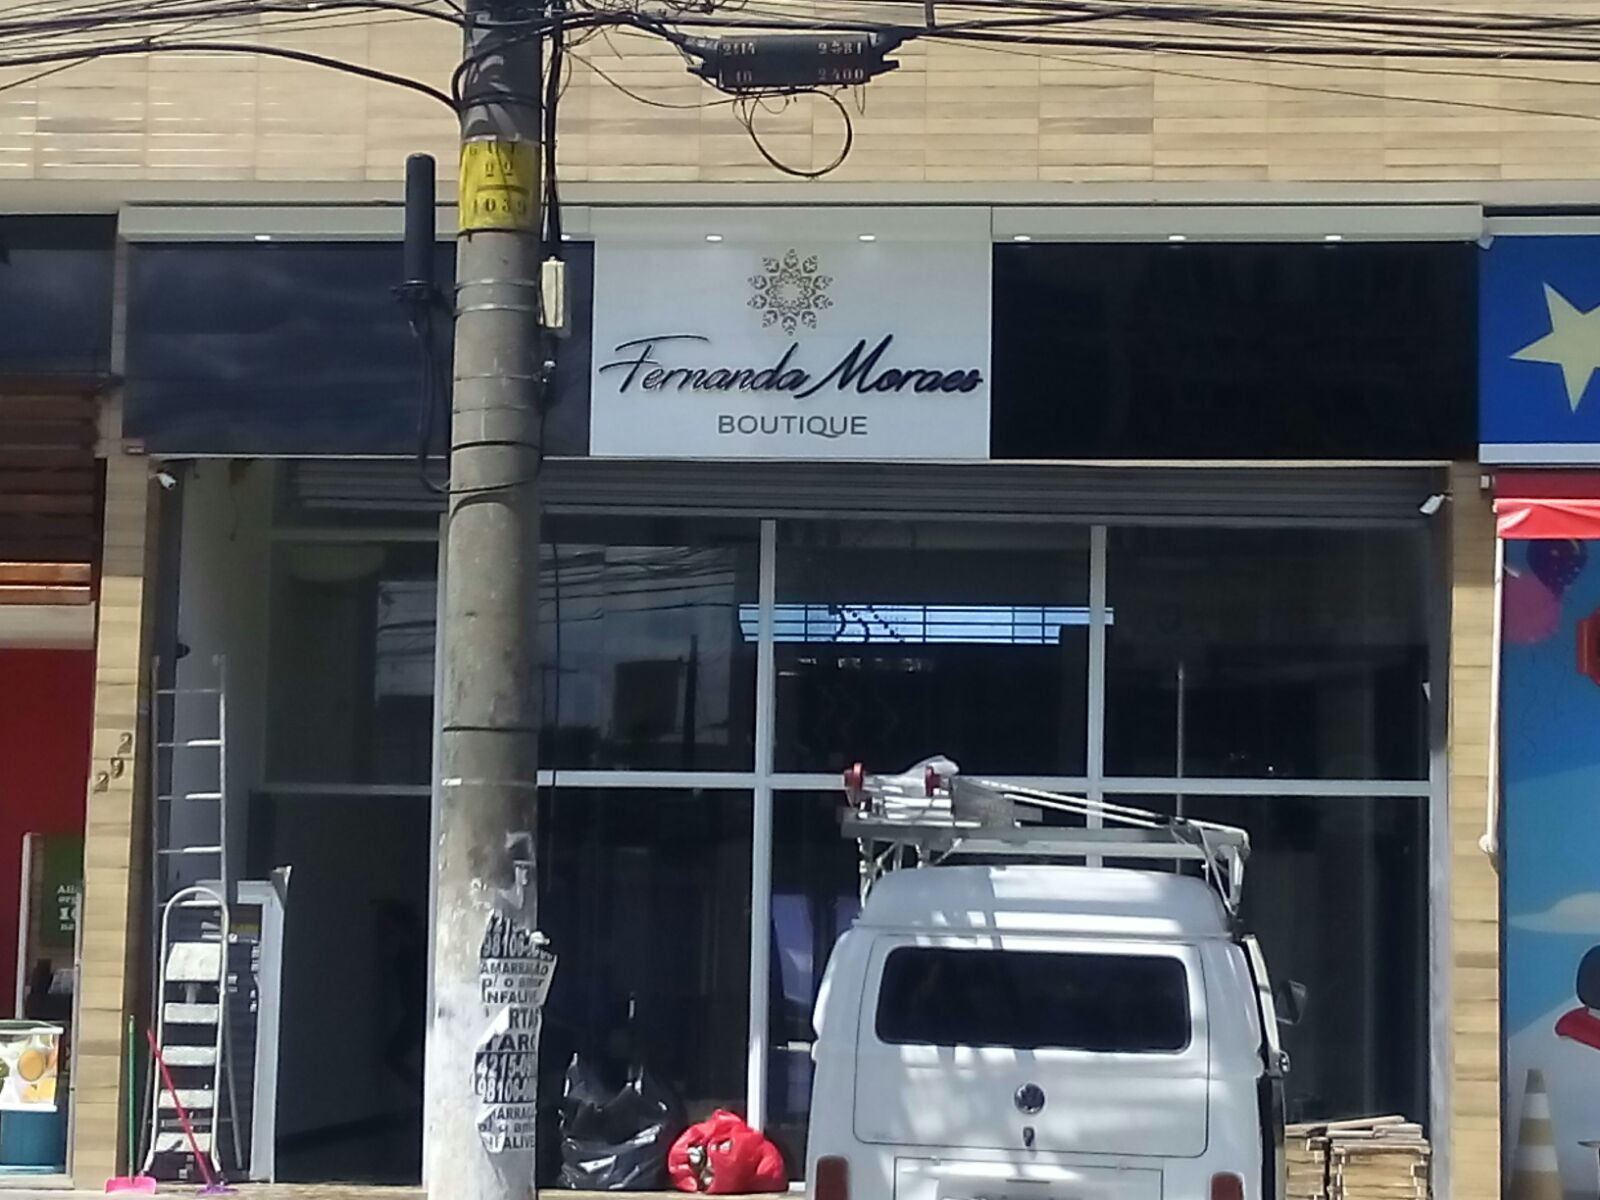 Boutique Fernanda Morais